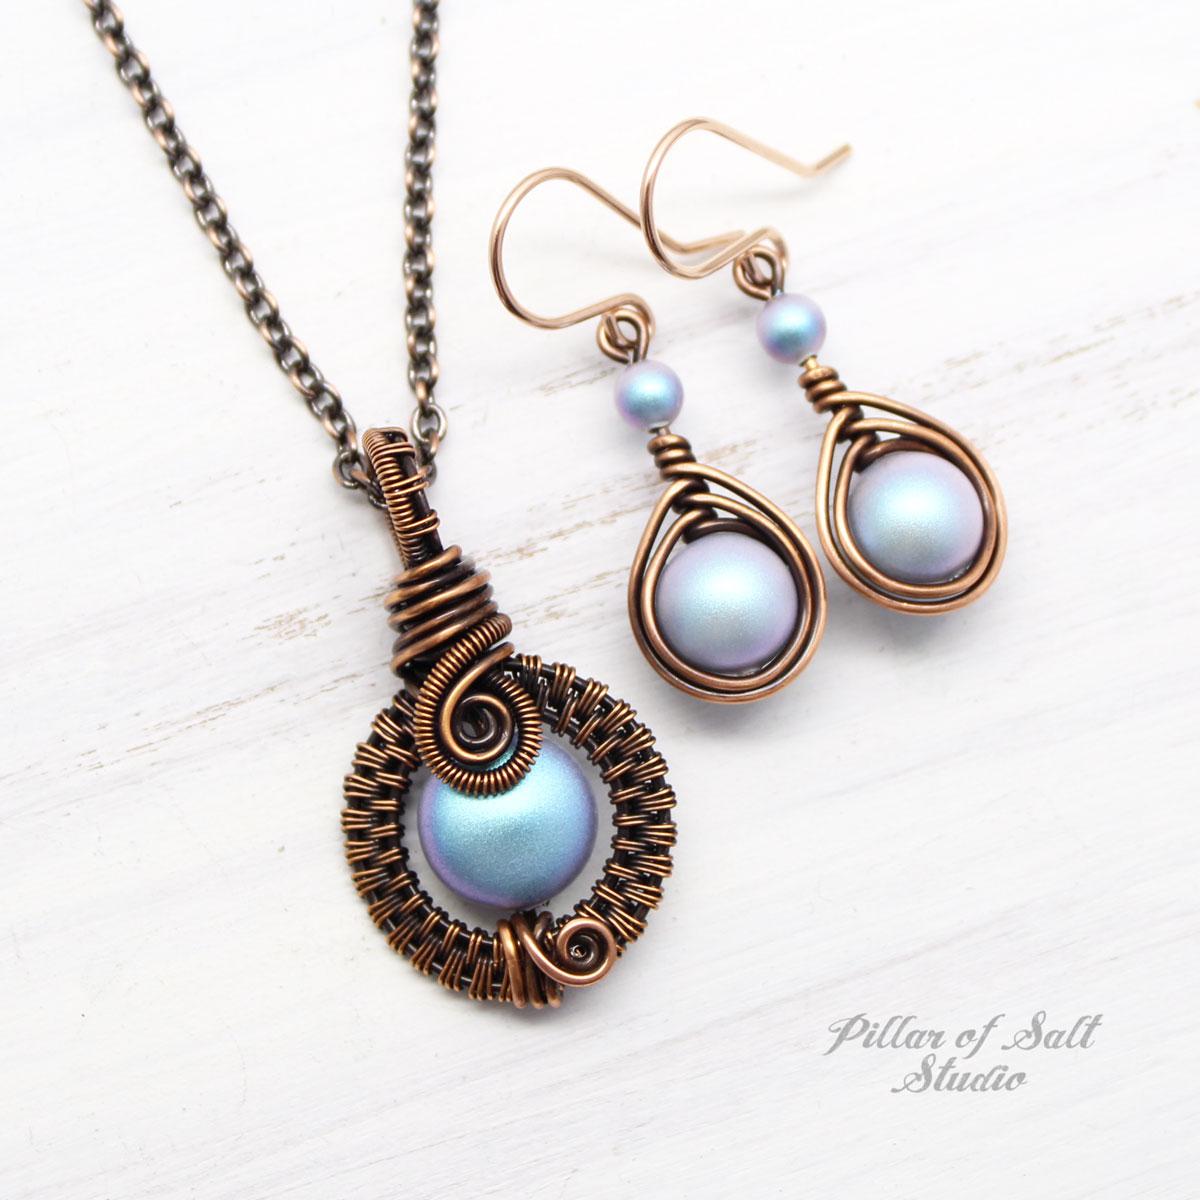 Light Blue Swarovski Pearl Necklace & Earring Set